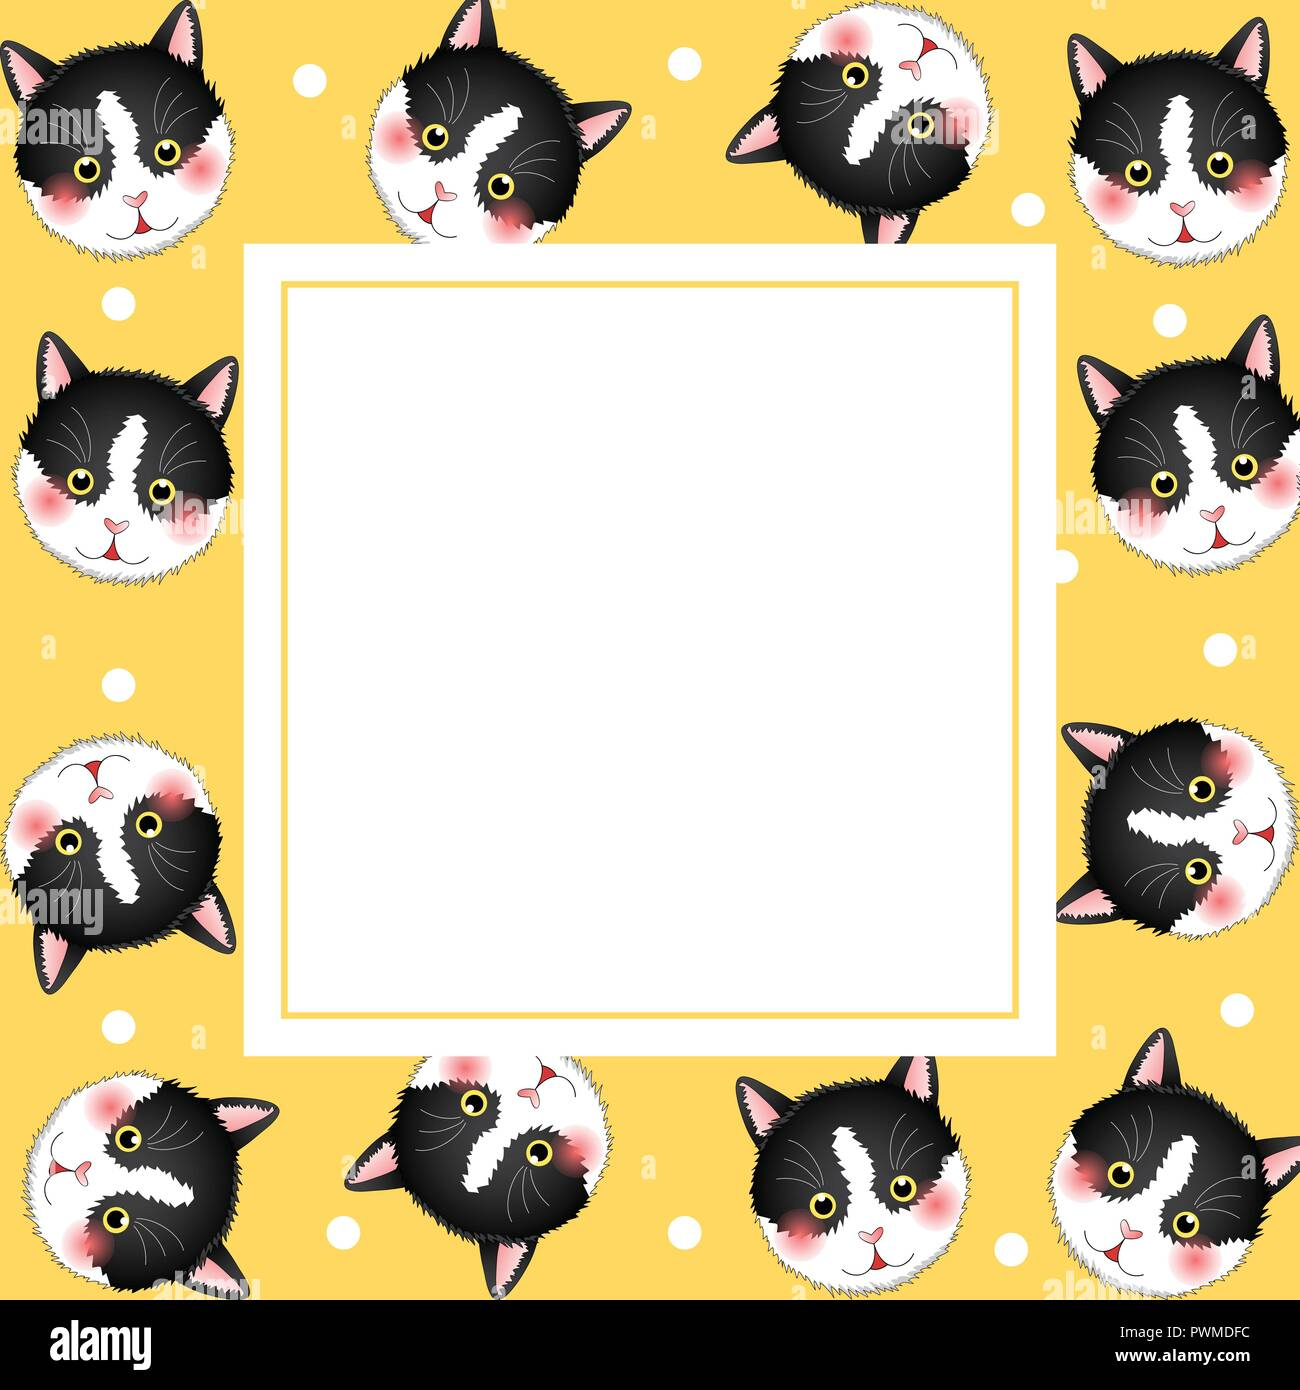 Black White Cat on Yellow Banner Card. Vector Illustration. - Stock Image